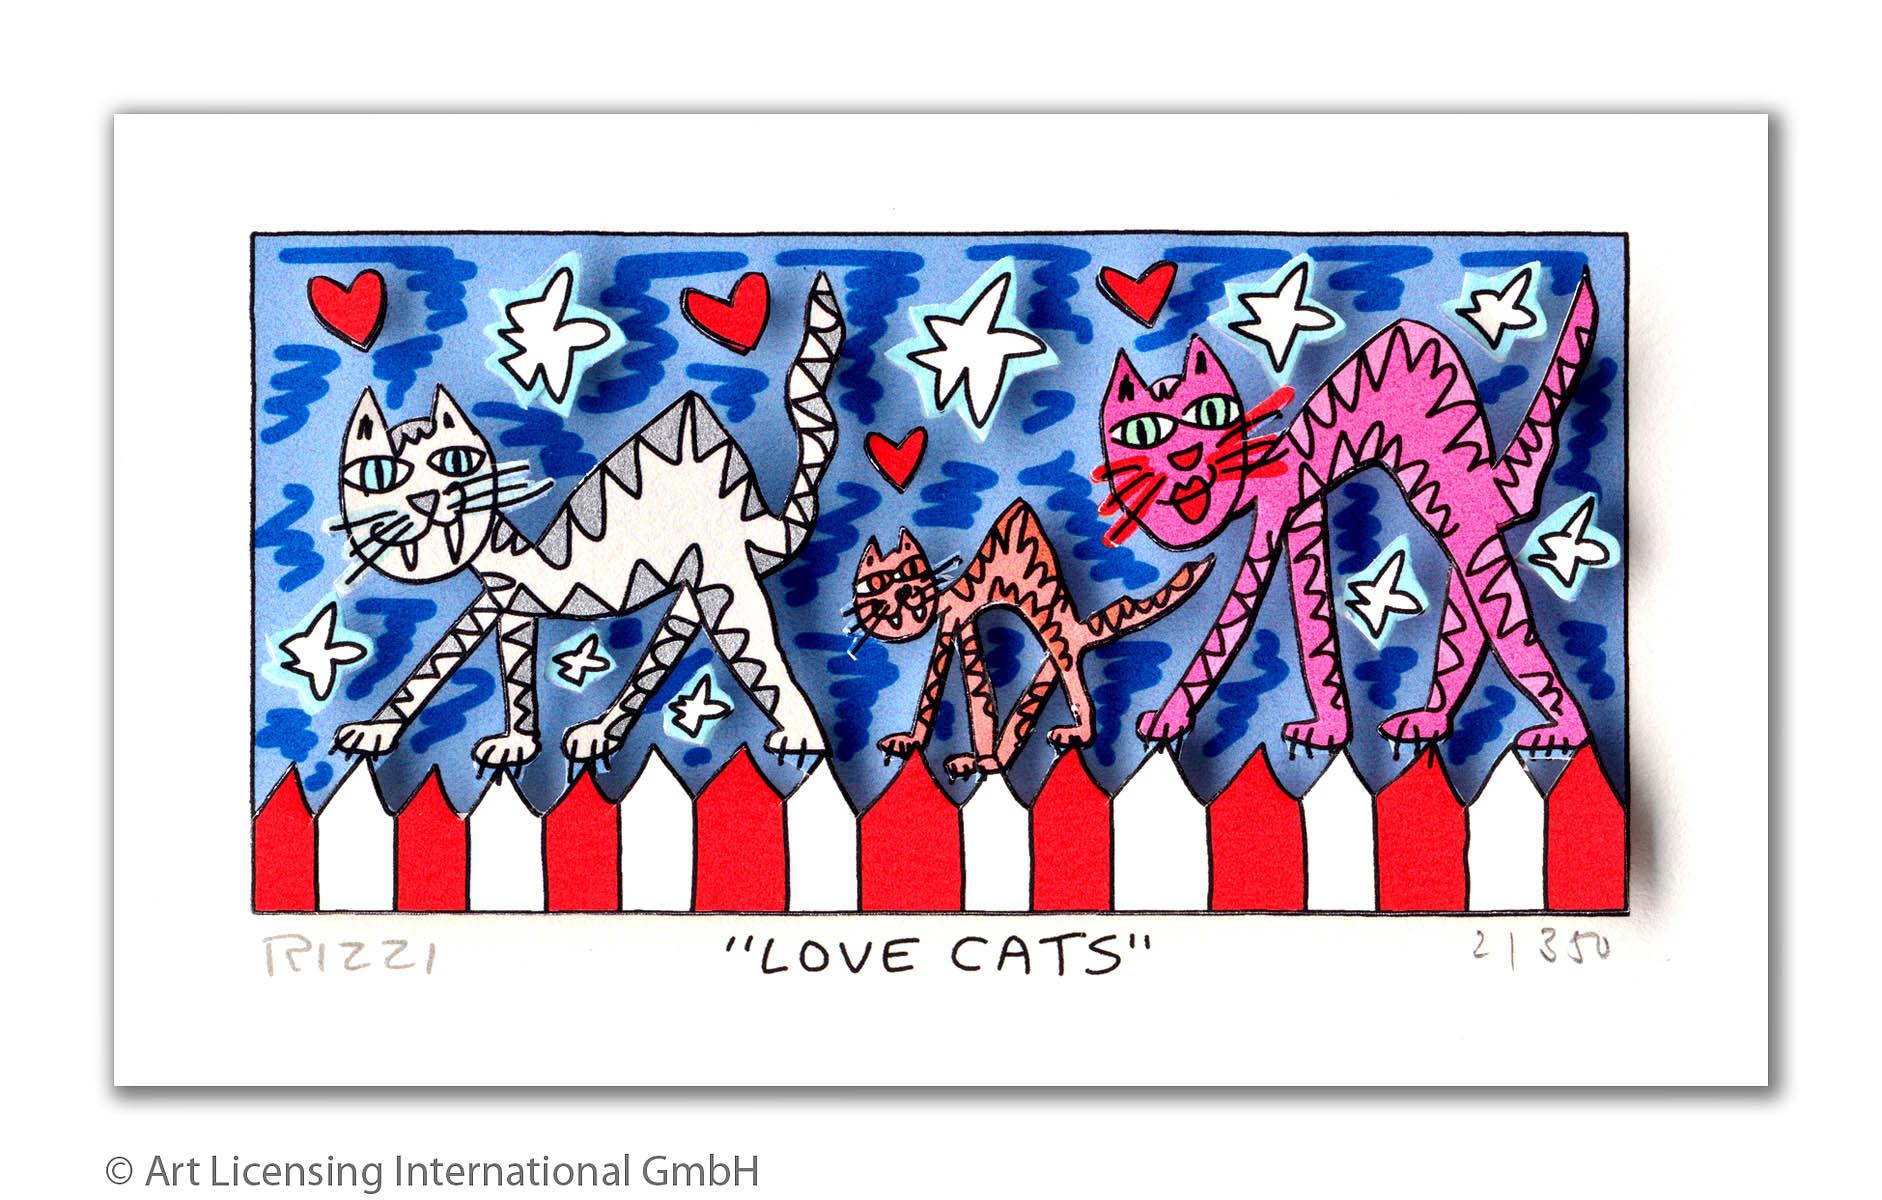 James Rizzi - LOVE CATS - Original 3D Bild drucksigniert - ohne Rahmen PP-Normale Nummer